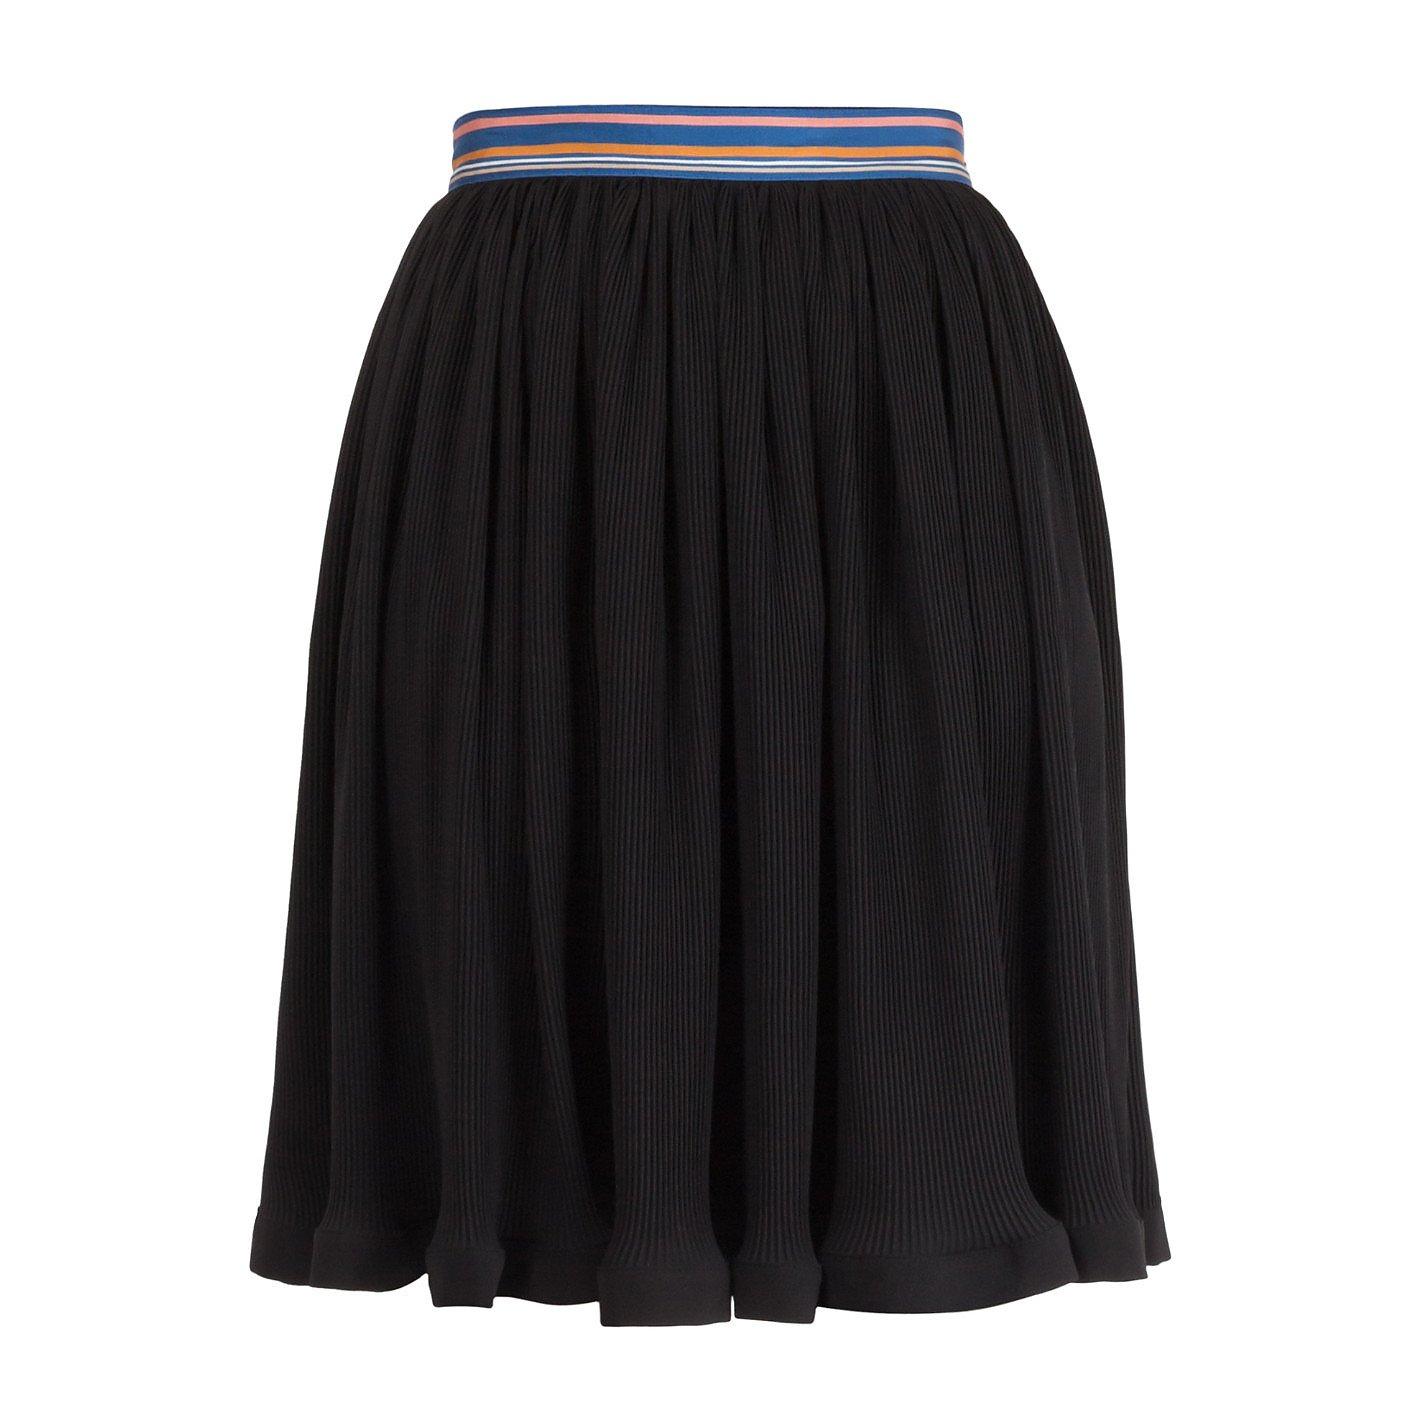 Paul Smith Micro-Pleat Skirt